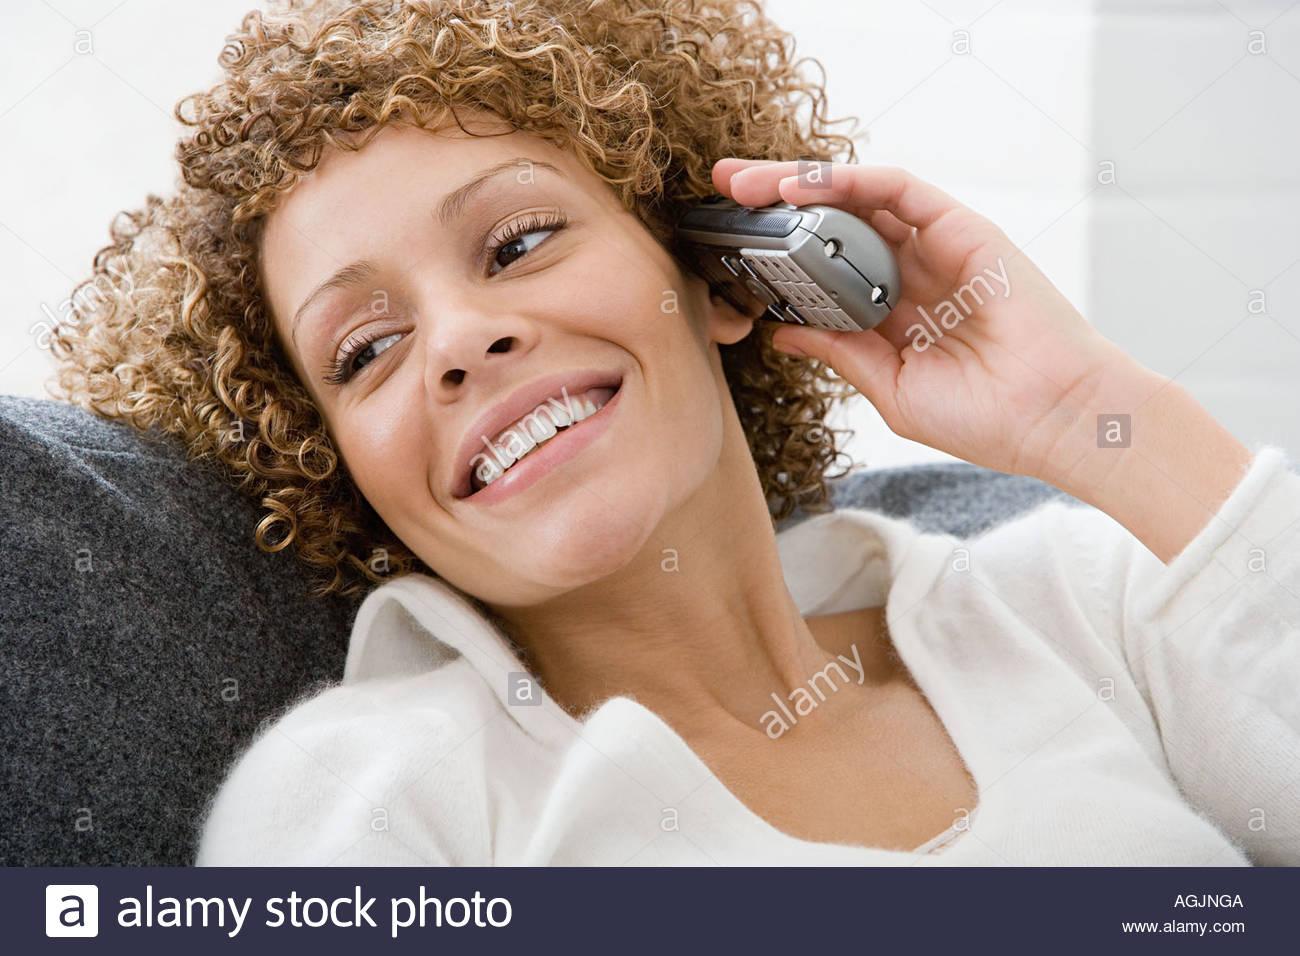 Woman on cordless telephone - Stock Image